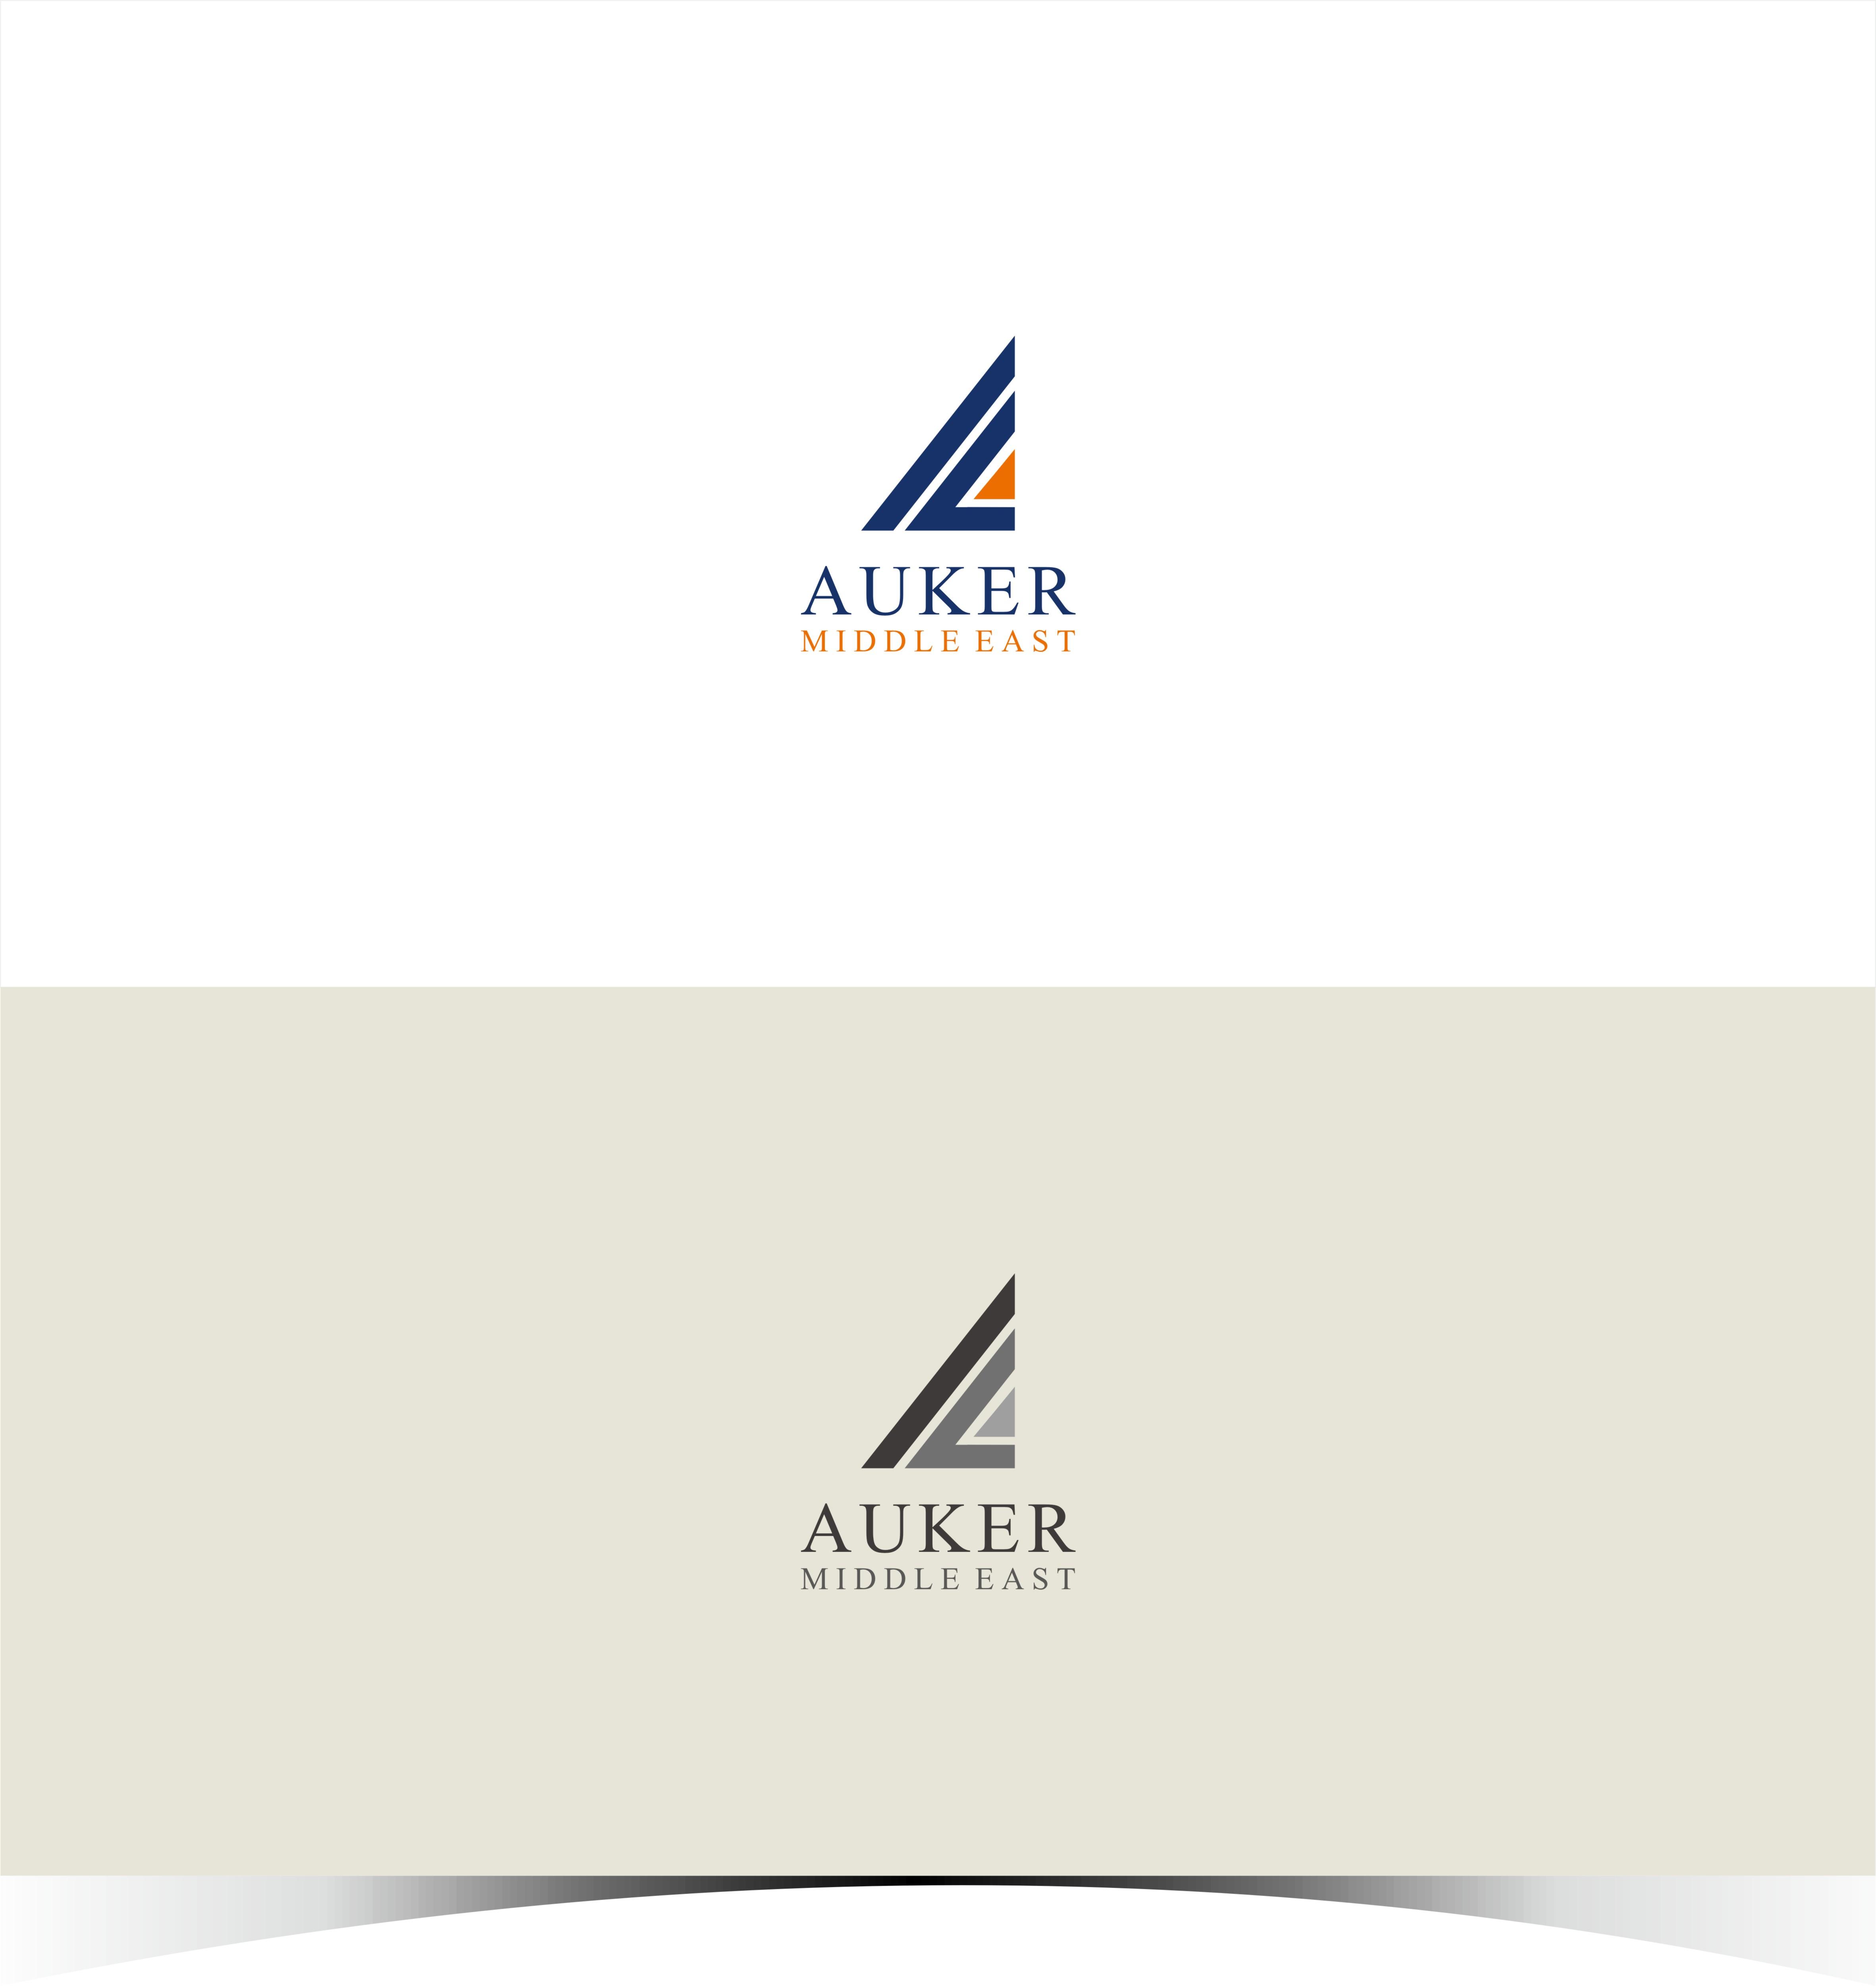 Acefb309b5